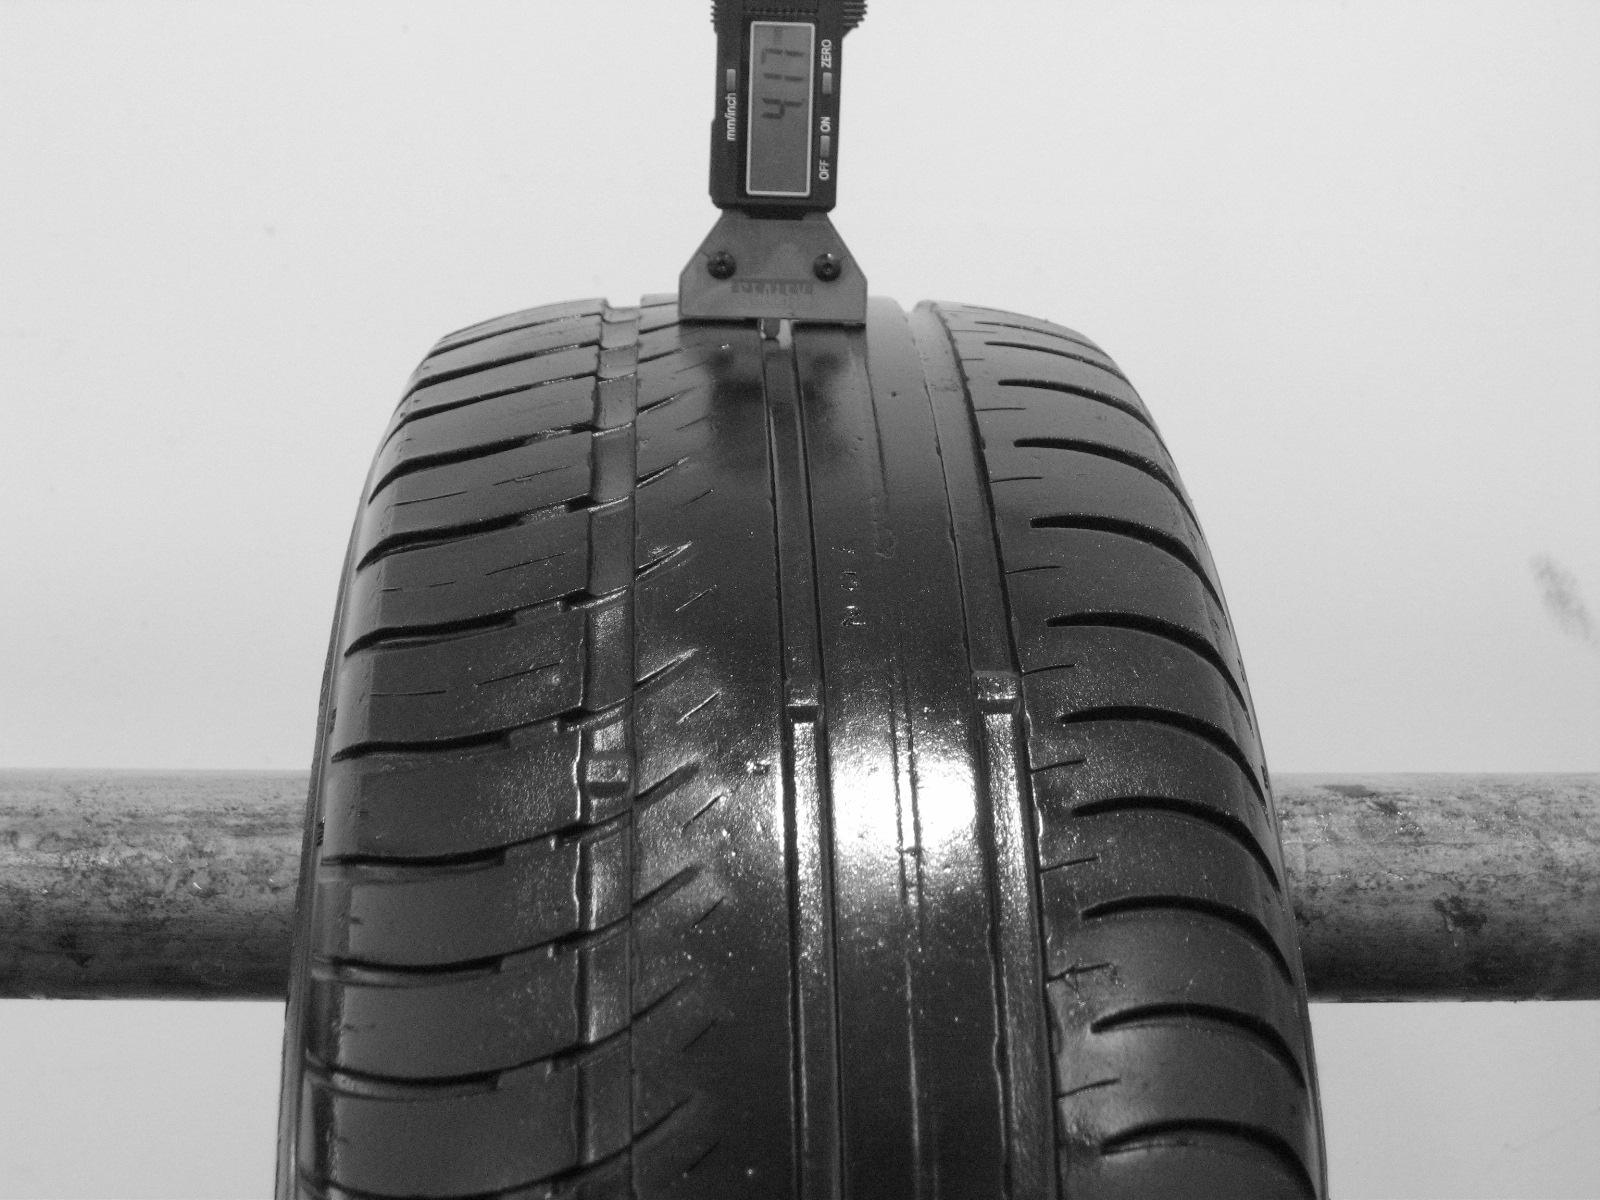 Použité-Pneu-Bazar - 195/65 R15 NOKIAN i3 -kusovka-rezerva 3mm